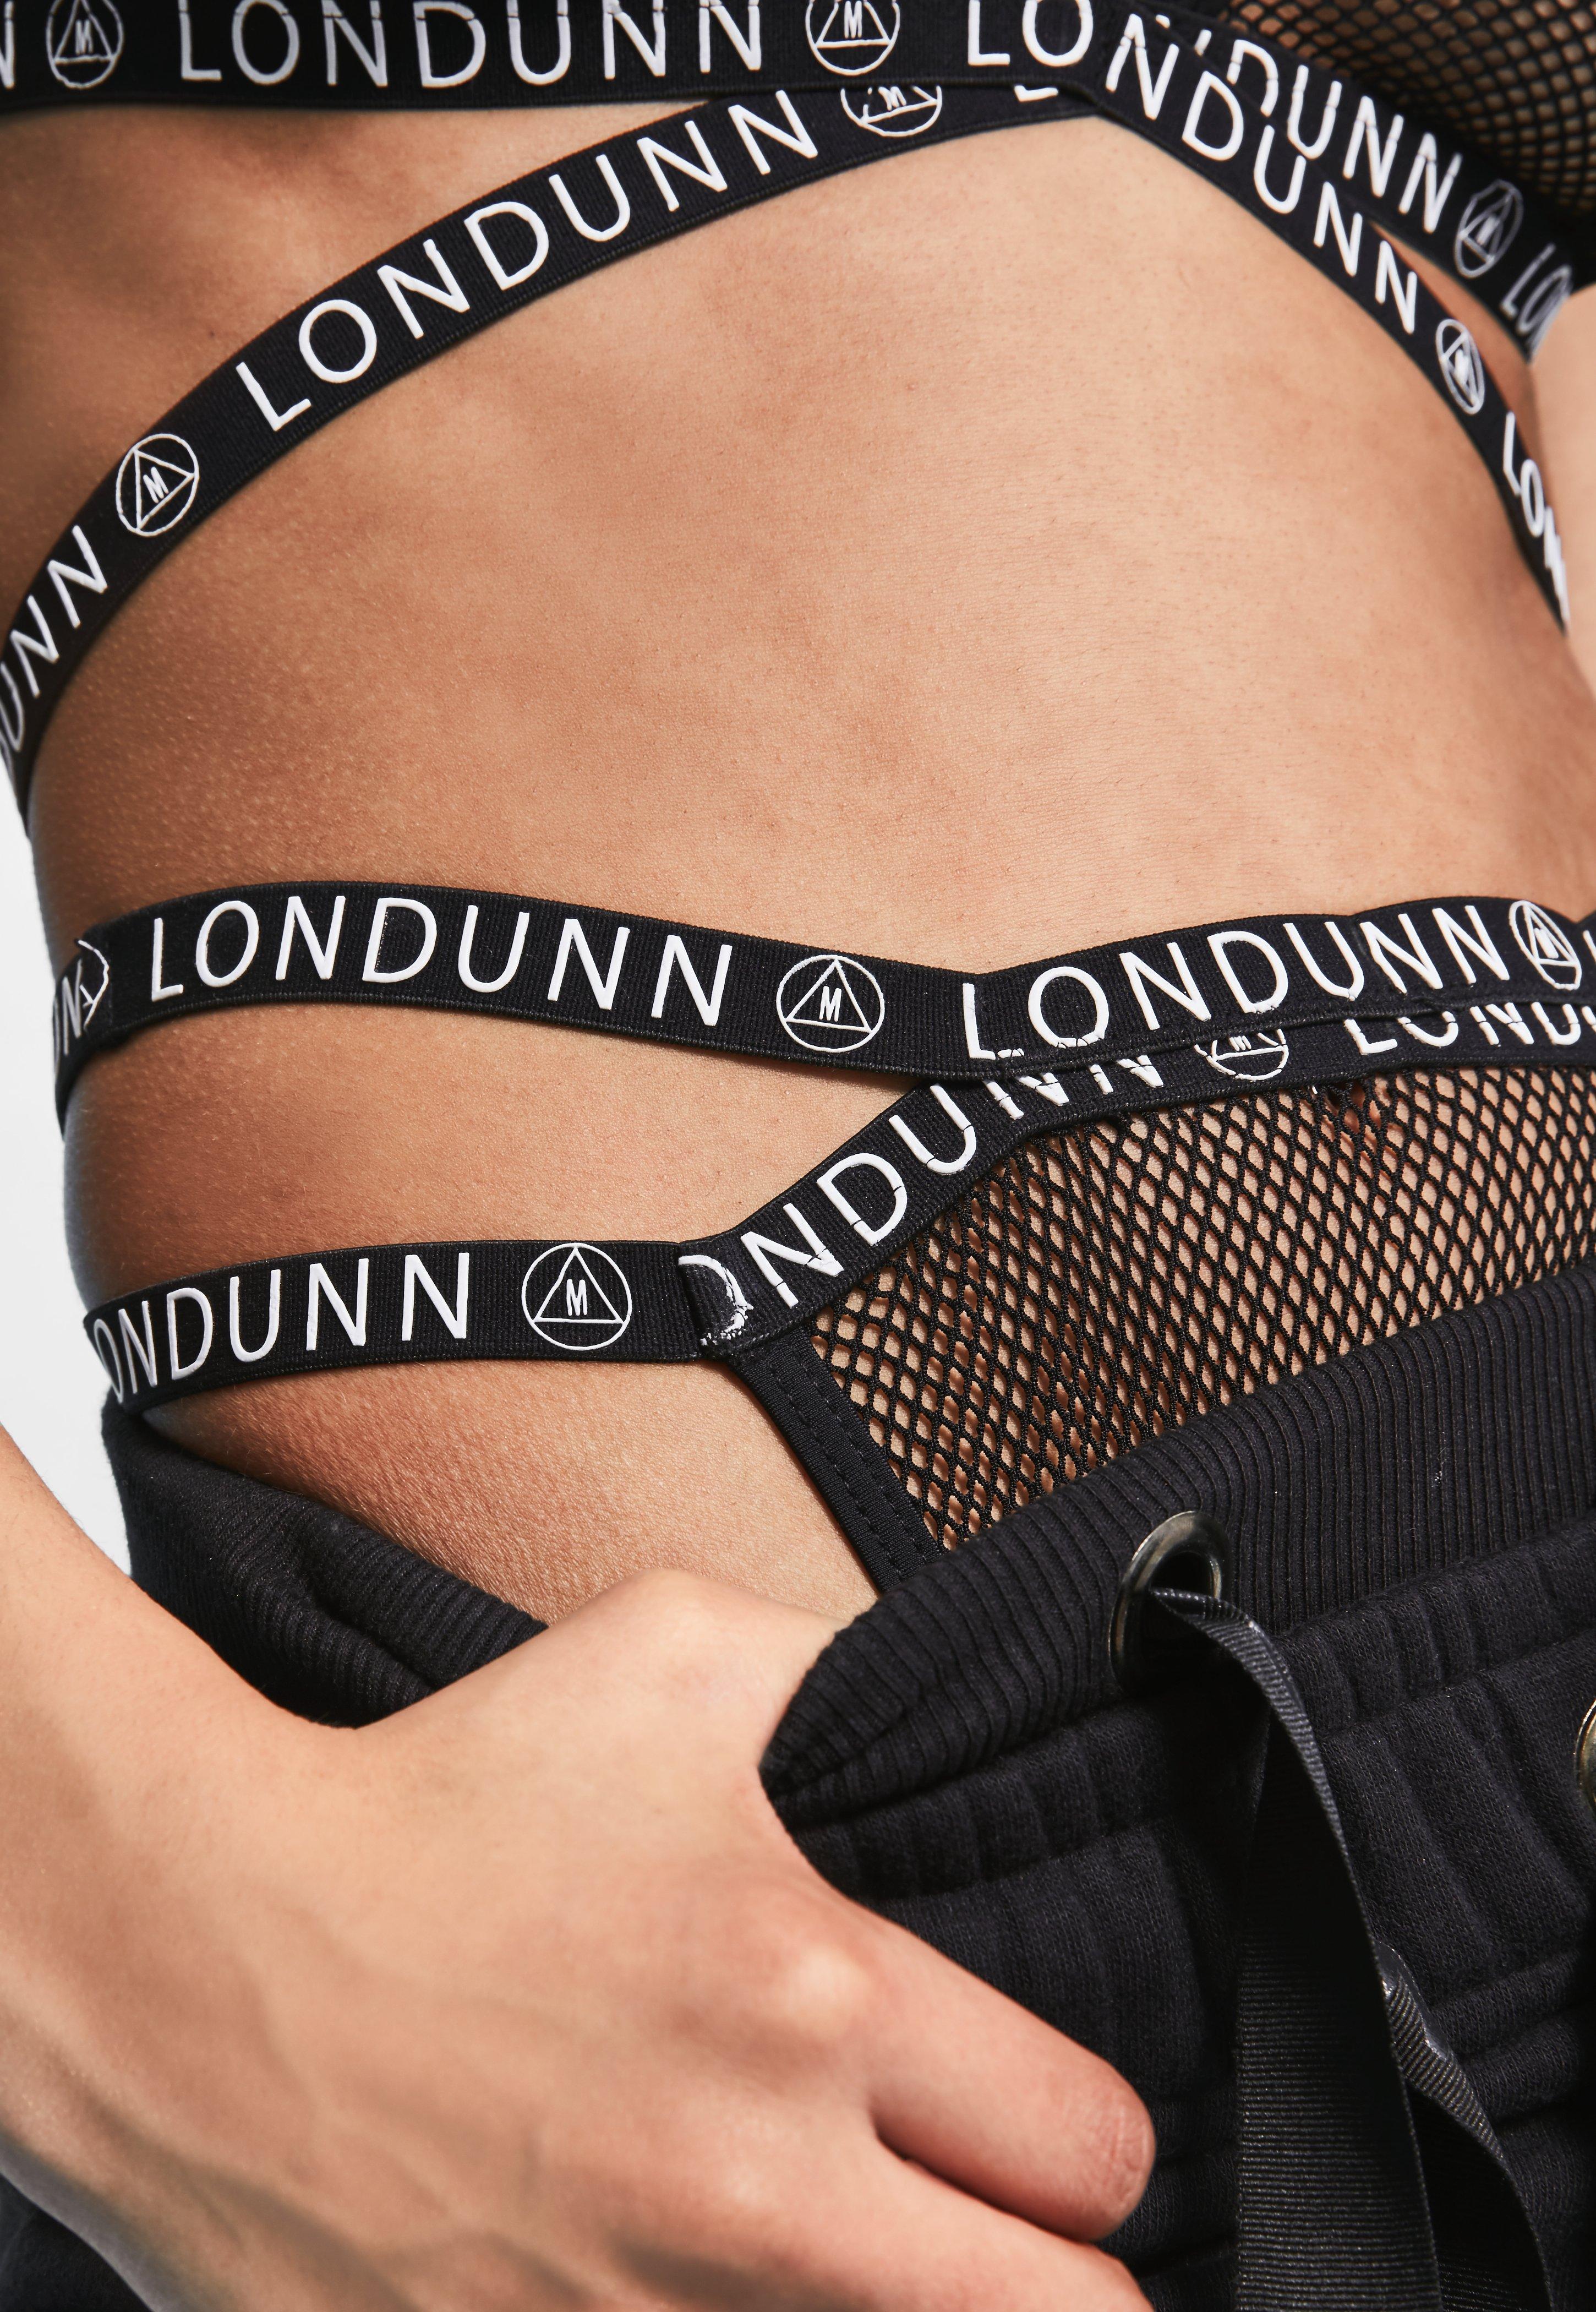 eb34406b69 Lyst - Missguided Londunn + Black Mesh Logo High Cut Knickers in Black